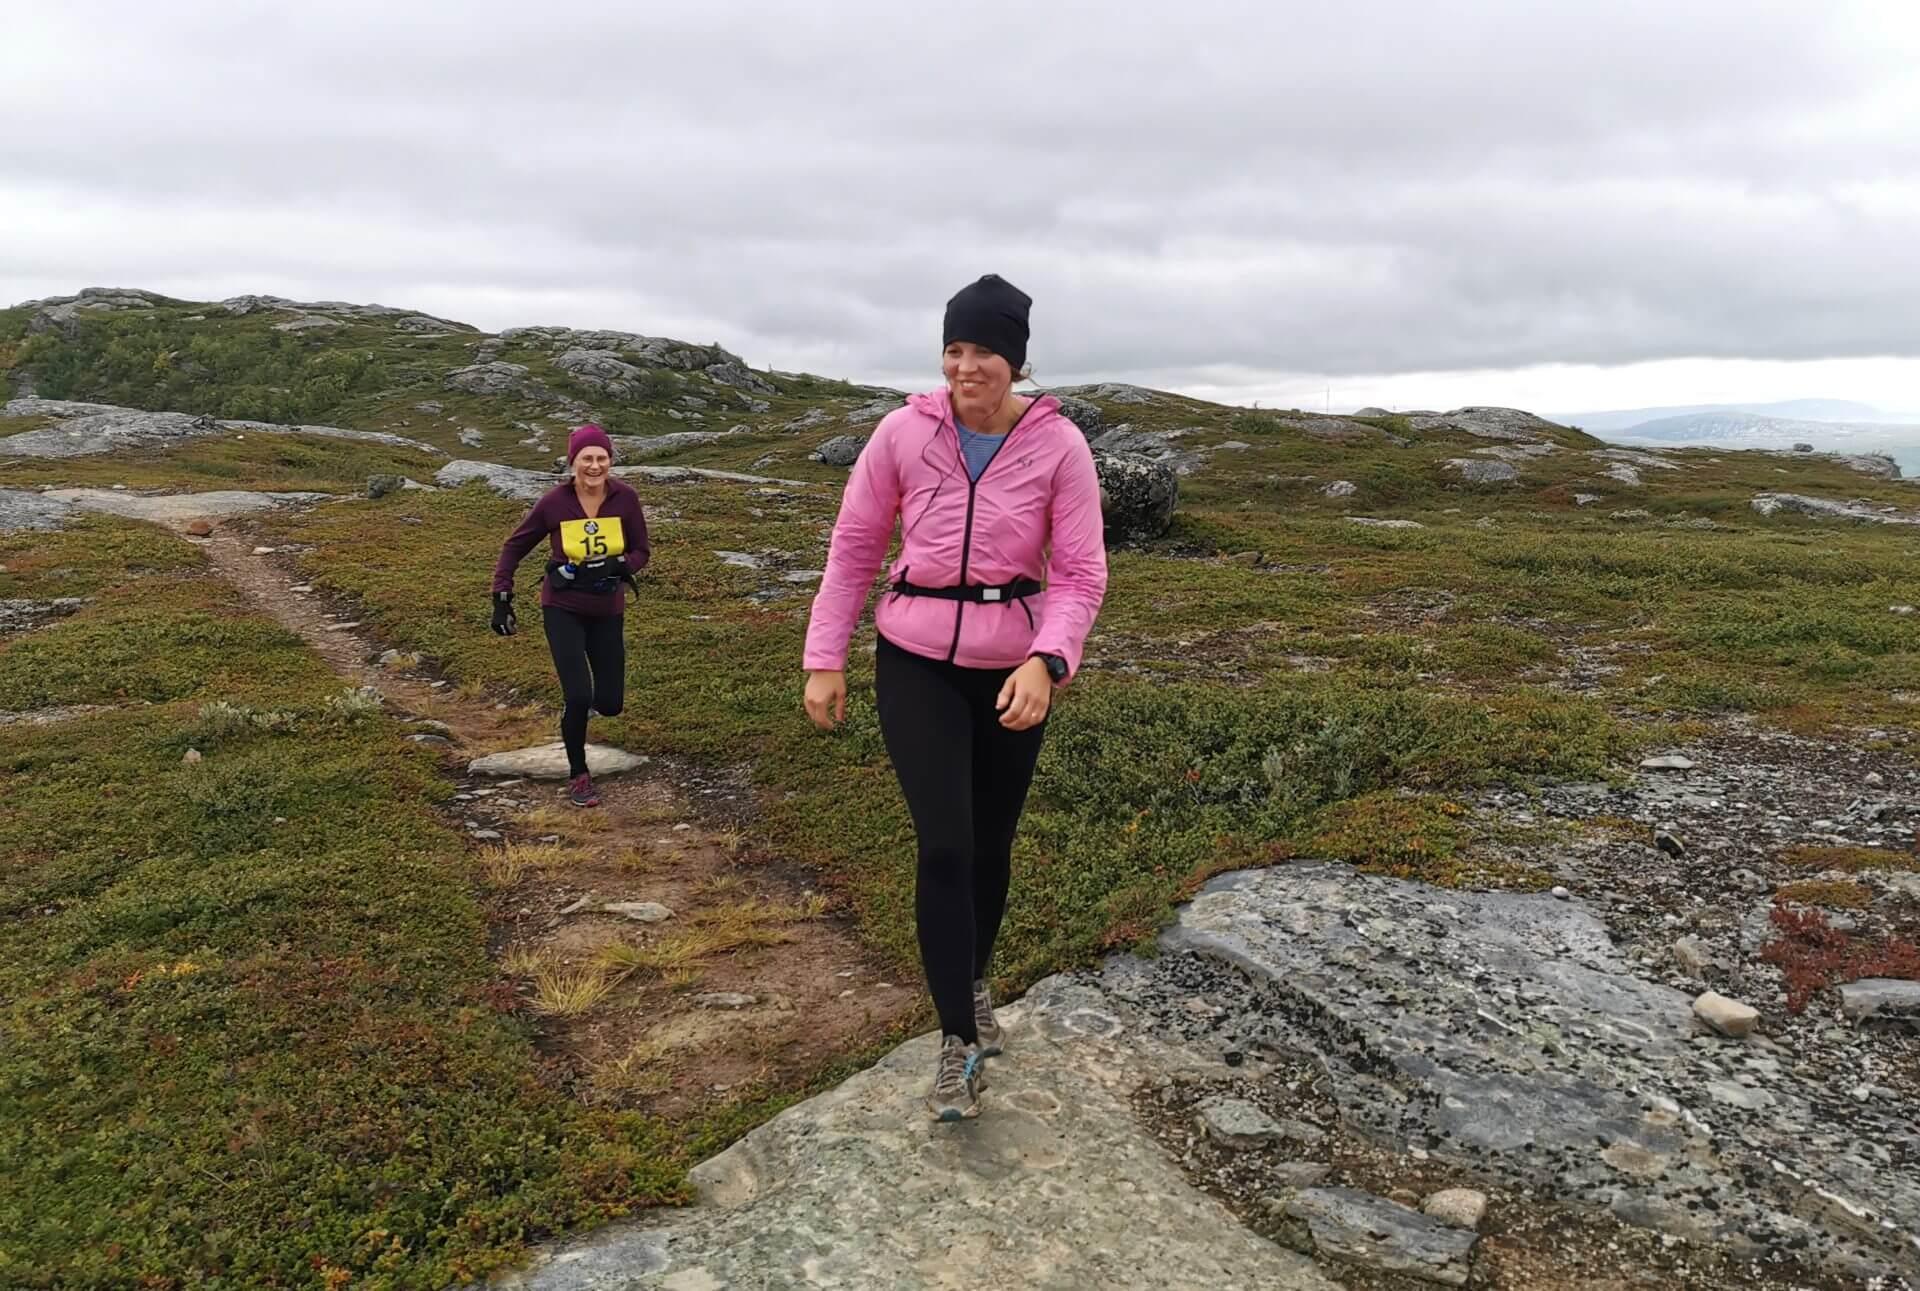 Arctic Circle Race 2019 Polcirkelloppet Guijaure kontr rosa 2